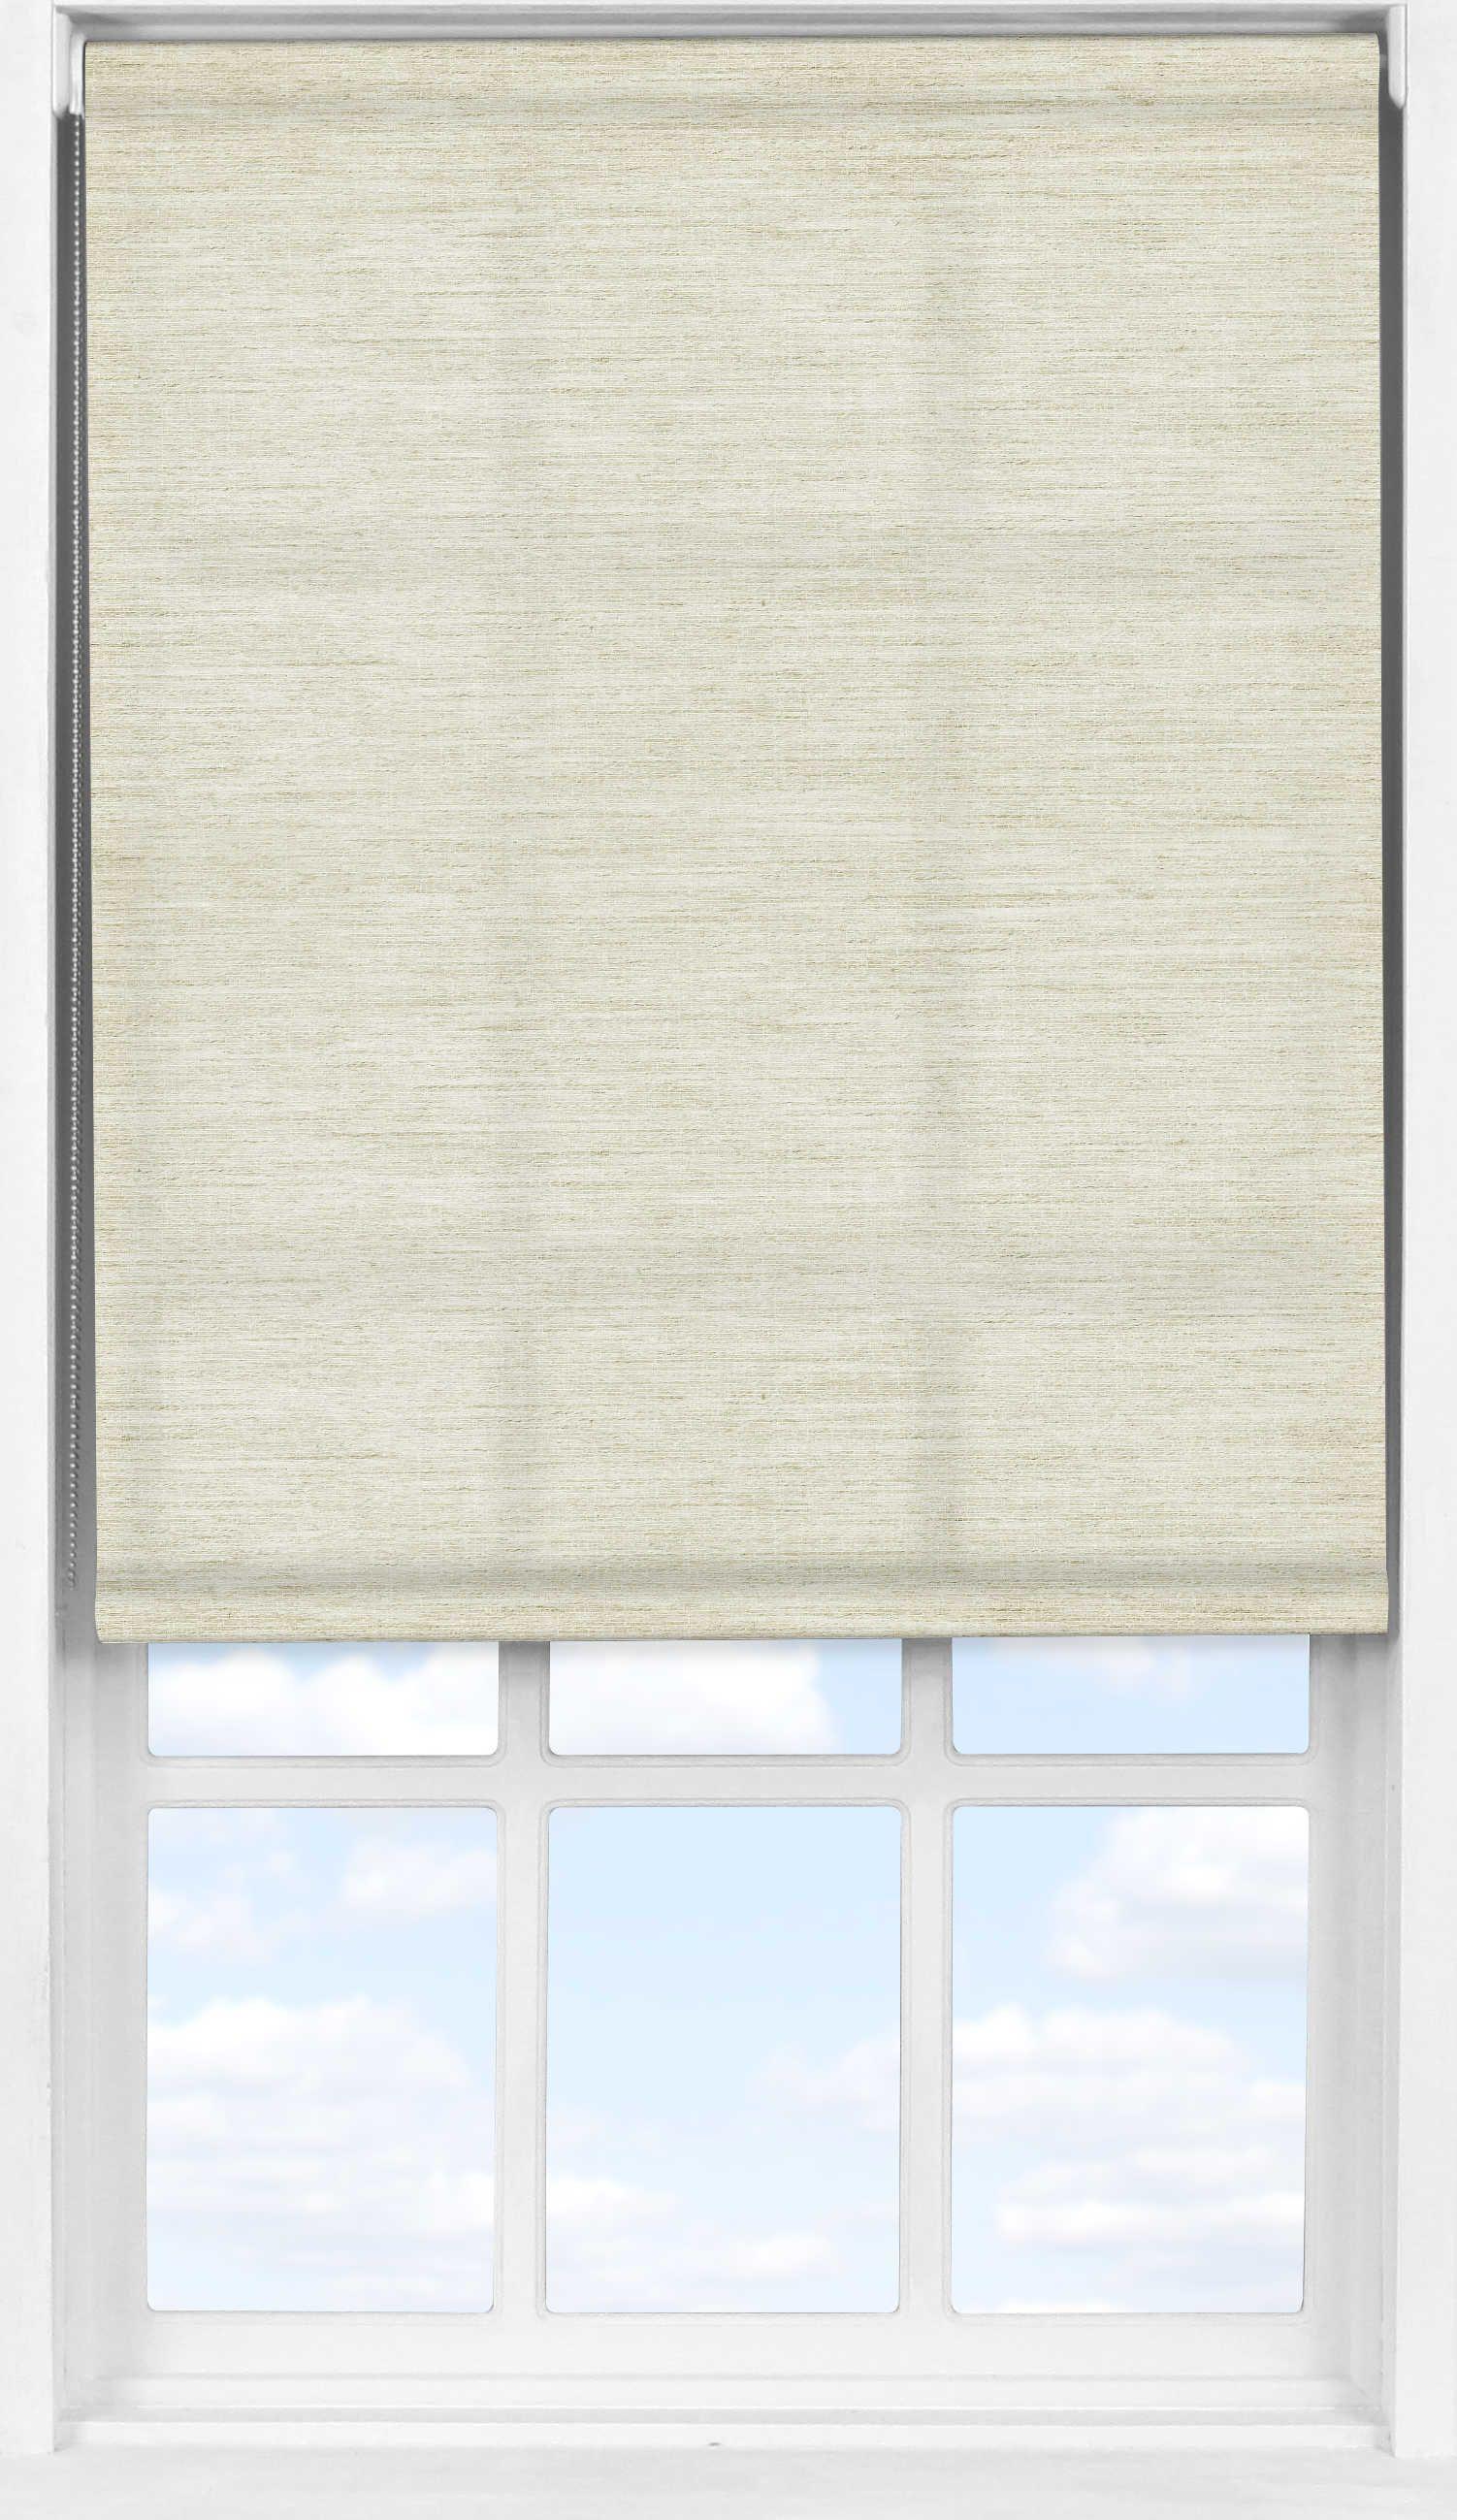 fabric blinds lowes horizontal top tips bamboo blinds lowes bedroom blinds rusticbamboo blackout naturalgrey wood